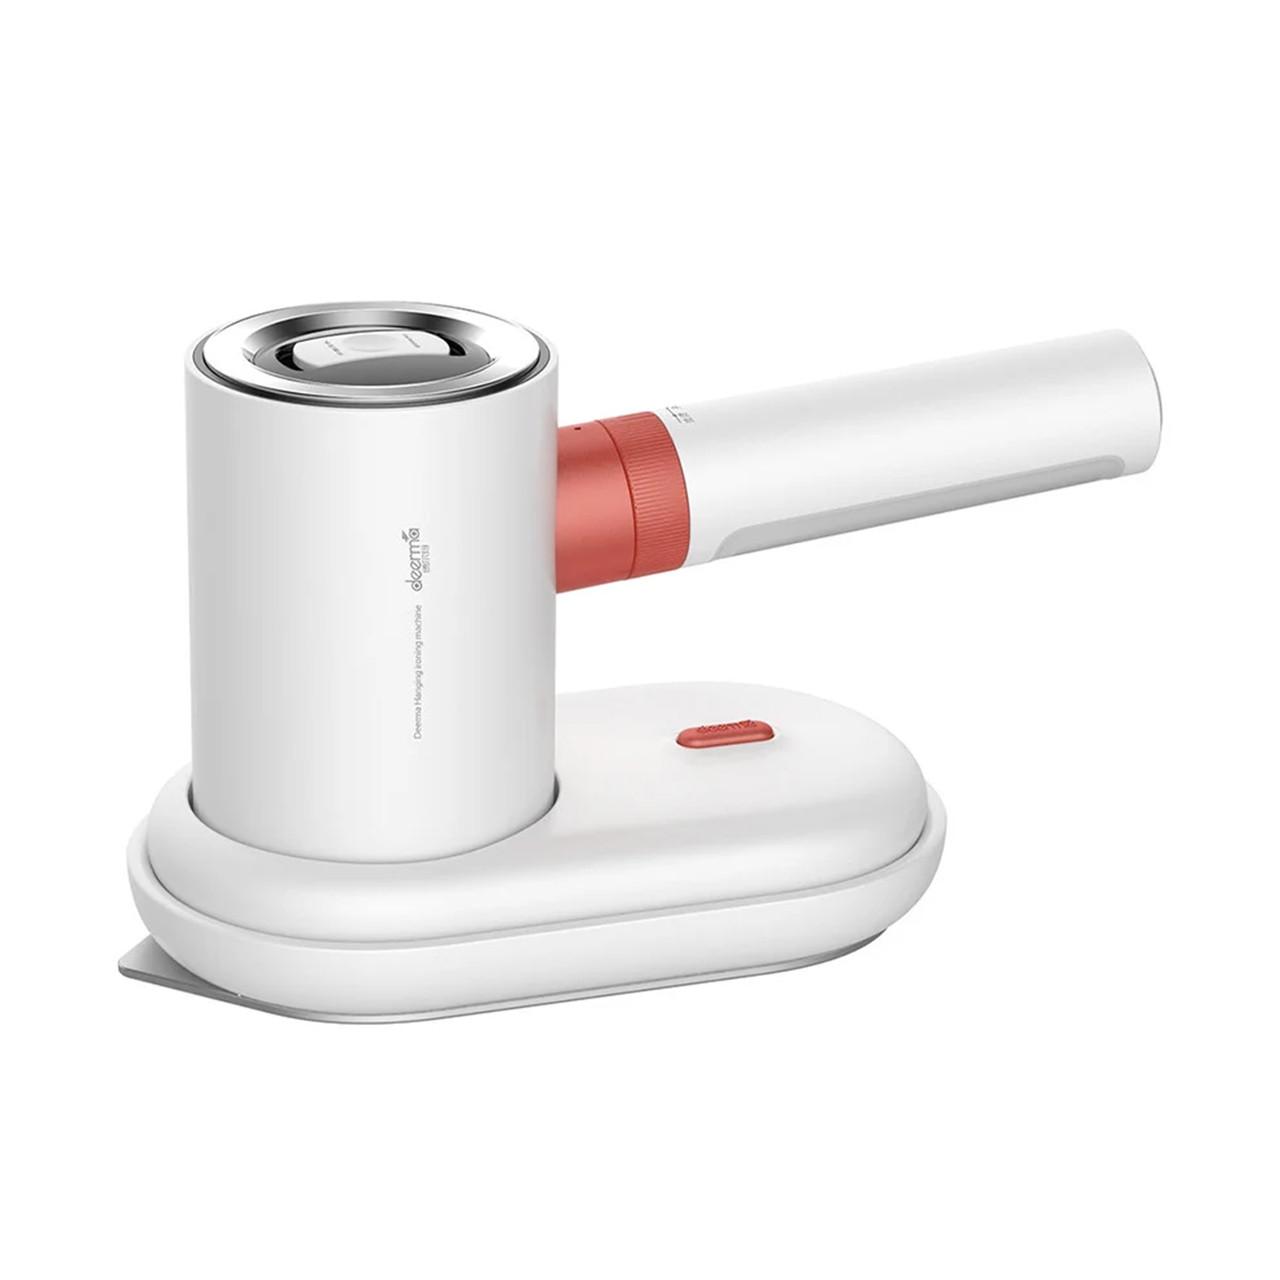 Ручной отпариватель Xiaomi Deerma Multifunctional Steam Ironing Machine (DEM-HS200), White